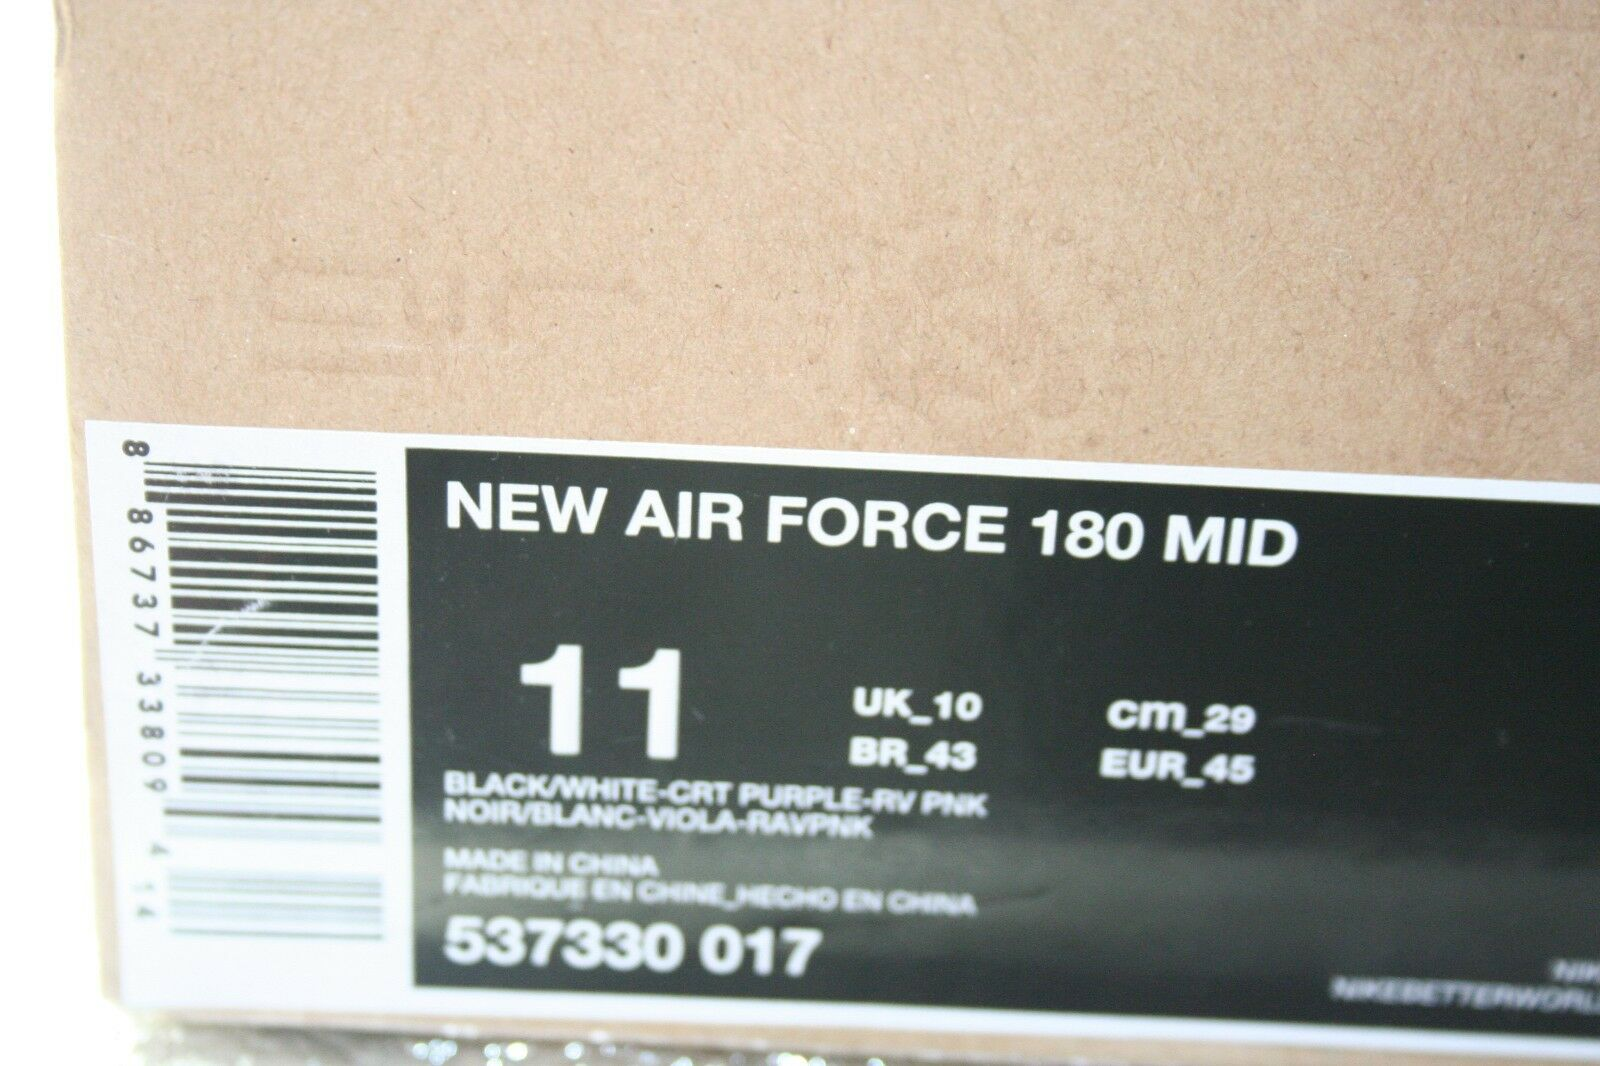 Nike Air Force 180 DS Size 11 Phoenix Suns Charles Barkley Clemson Tigers